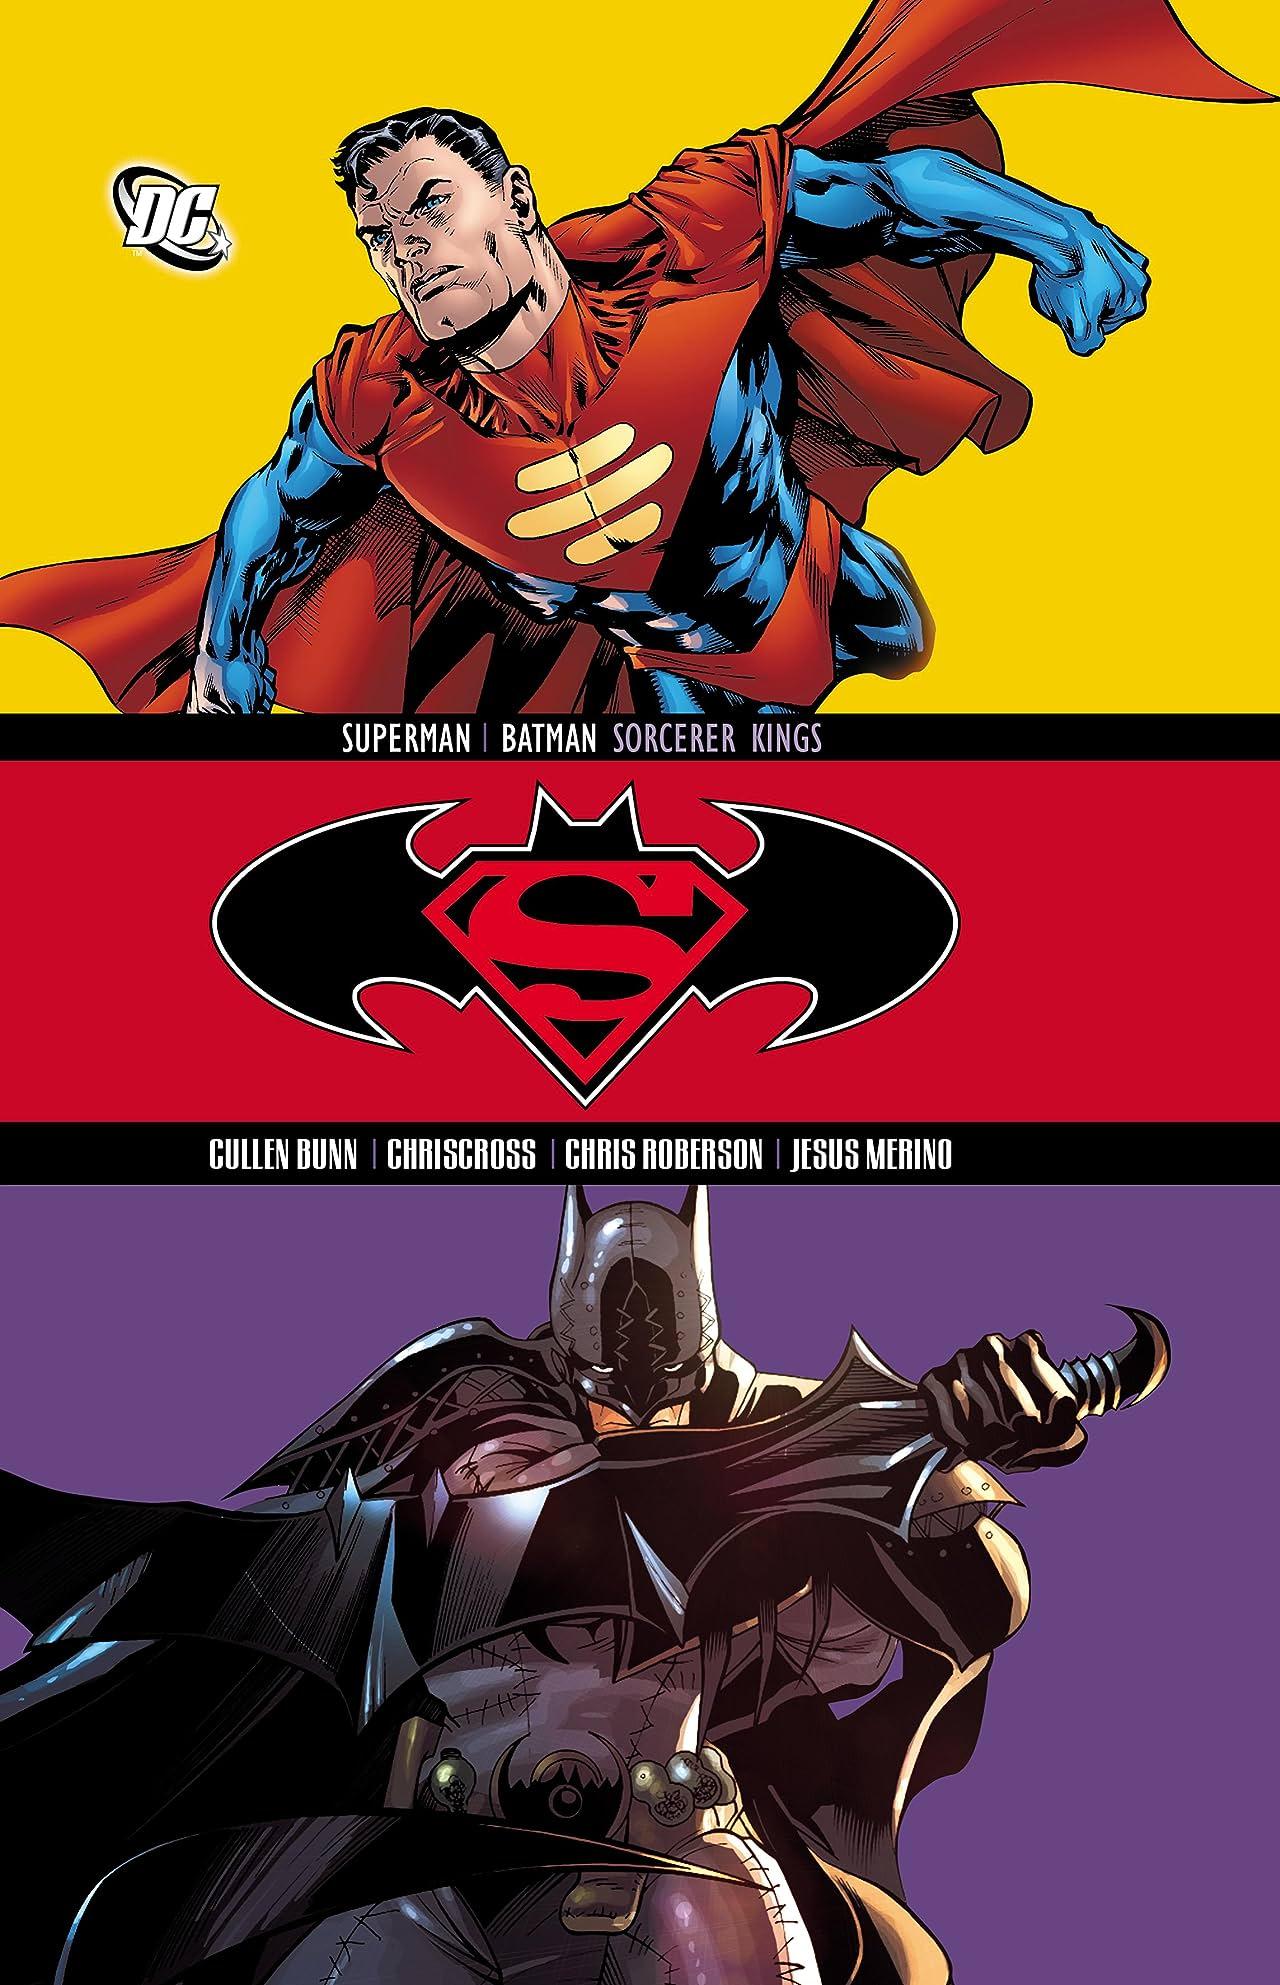 Superman/Batman: Sorcerer Kings